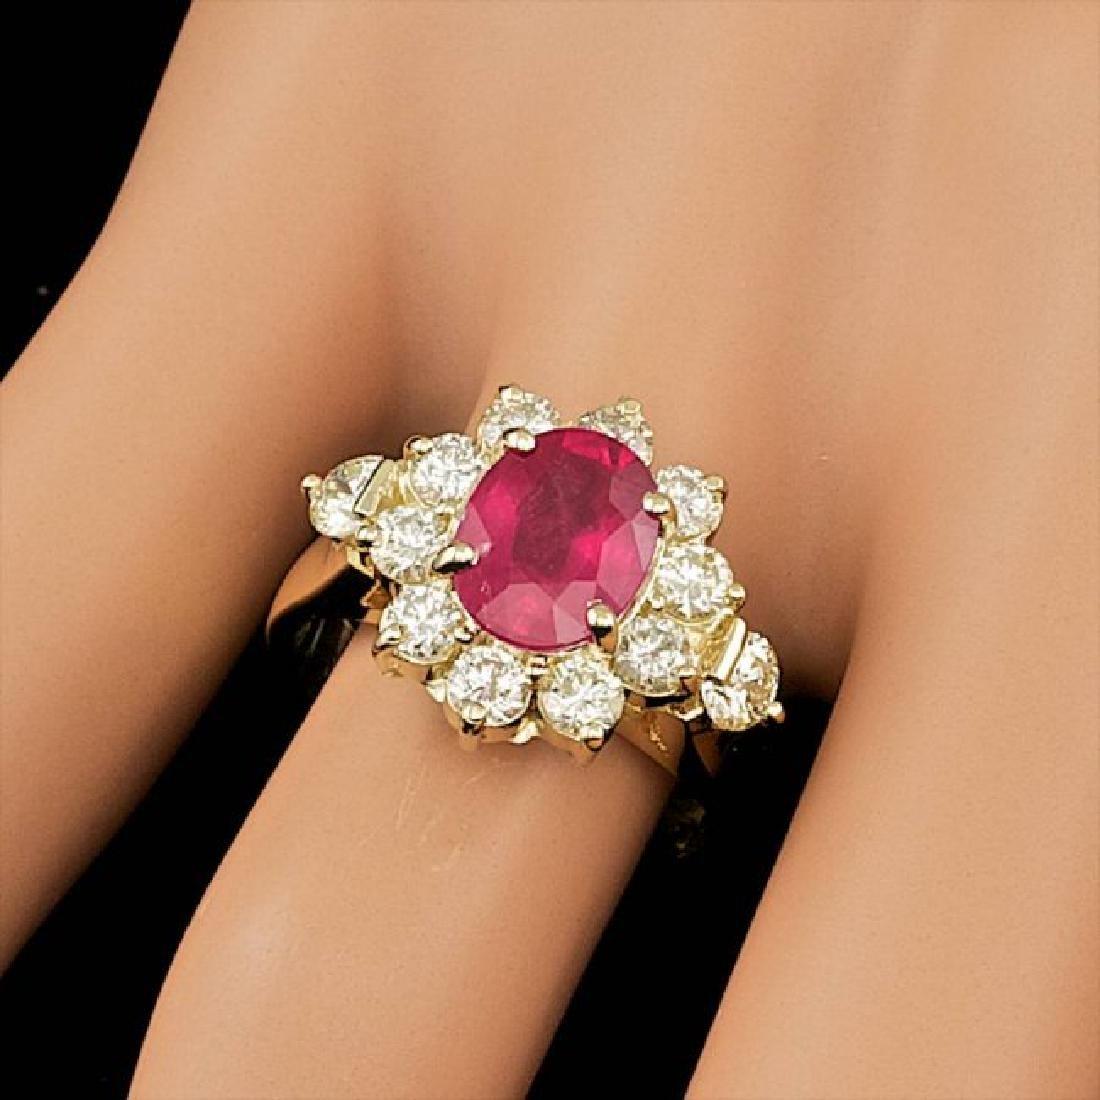 14k Yellow Gold 2.50ct Ruby 1.50ct Diamond Ring - 3